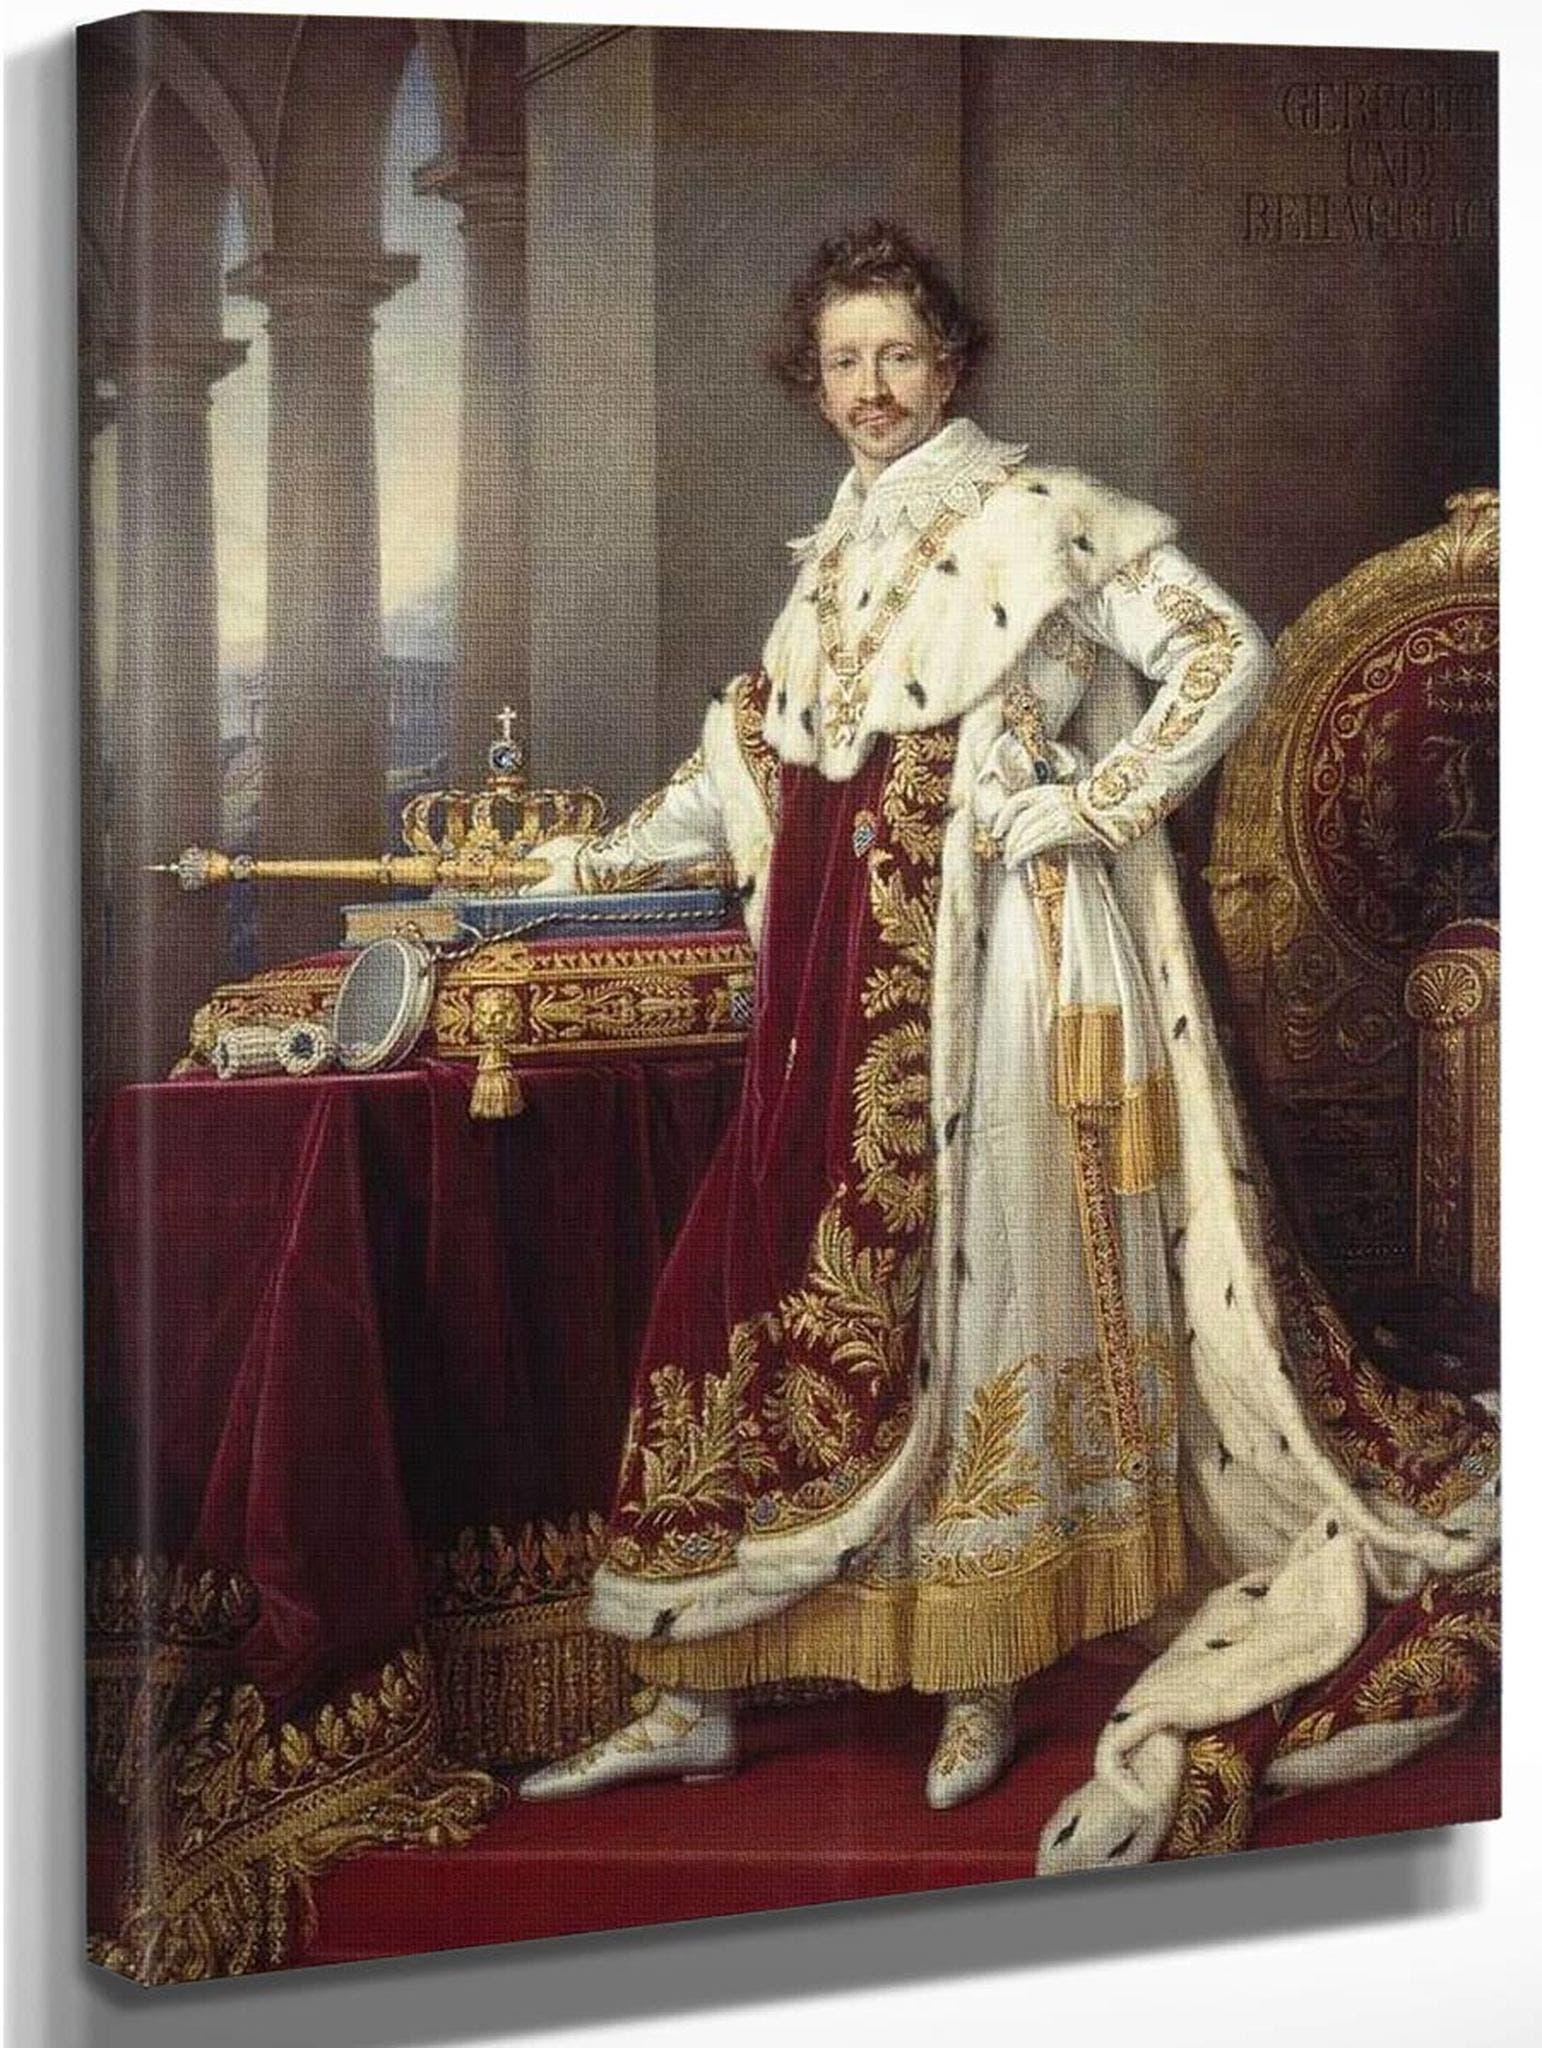 King Ludwig 1